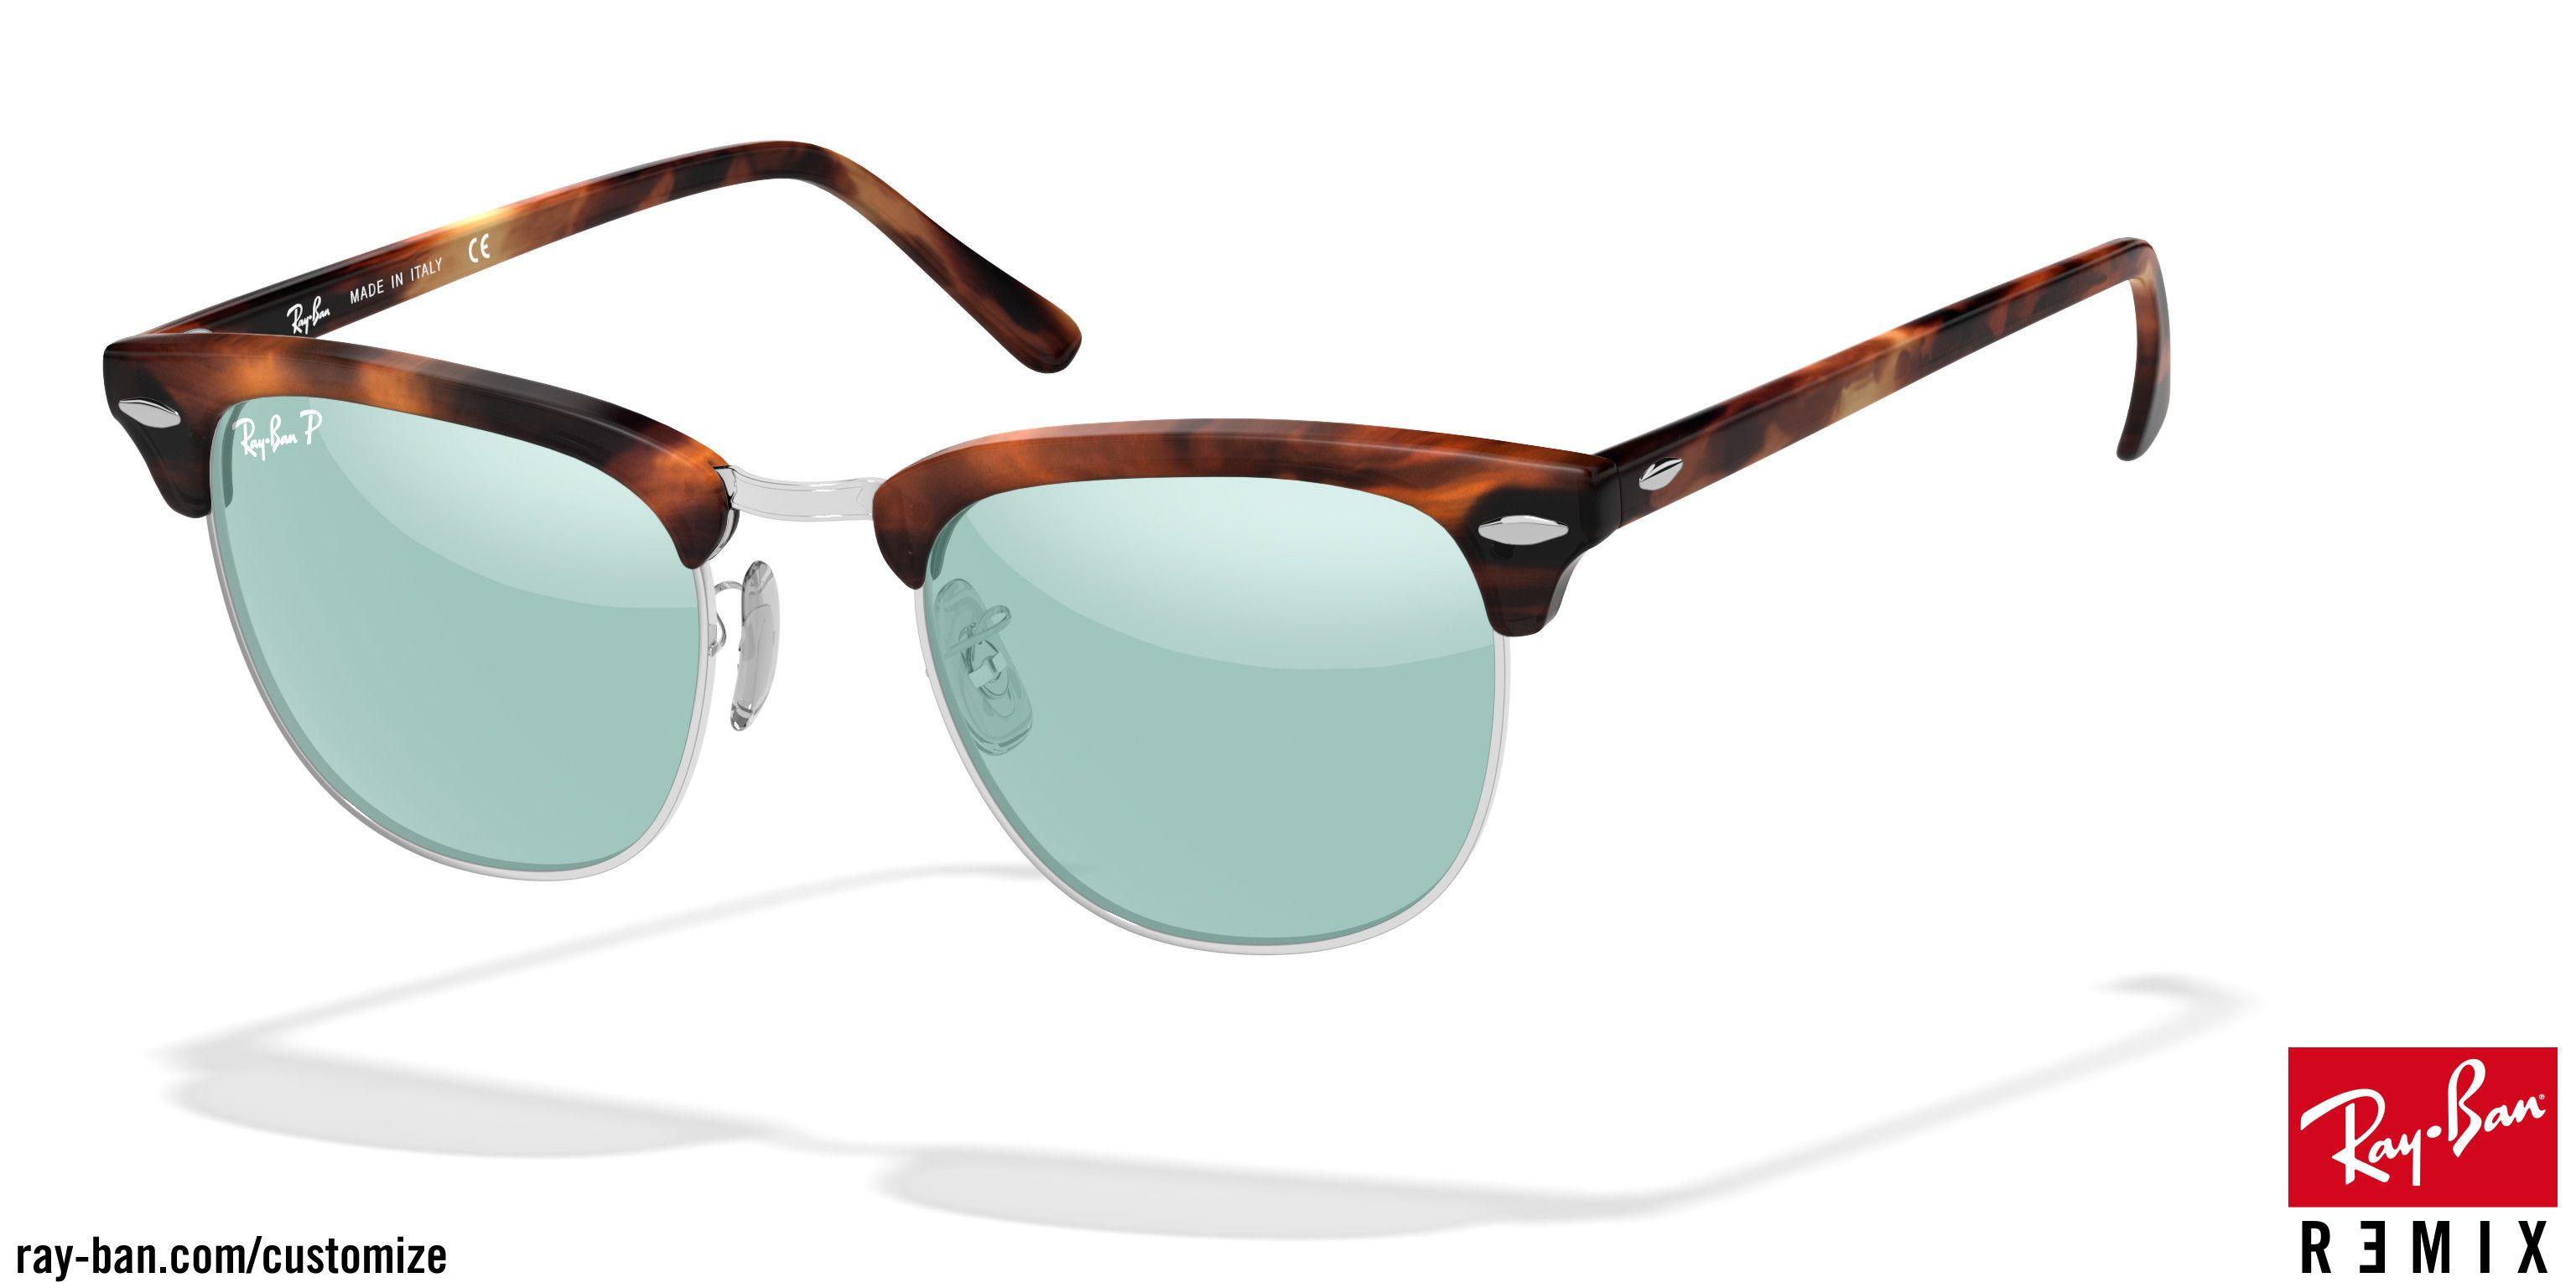 d8e33763ac official sunglasses thurmont tortoiseshell tortoiseshell brown custom ray  ban clubmaster classic rb3016 with matte tortoise shell